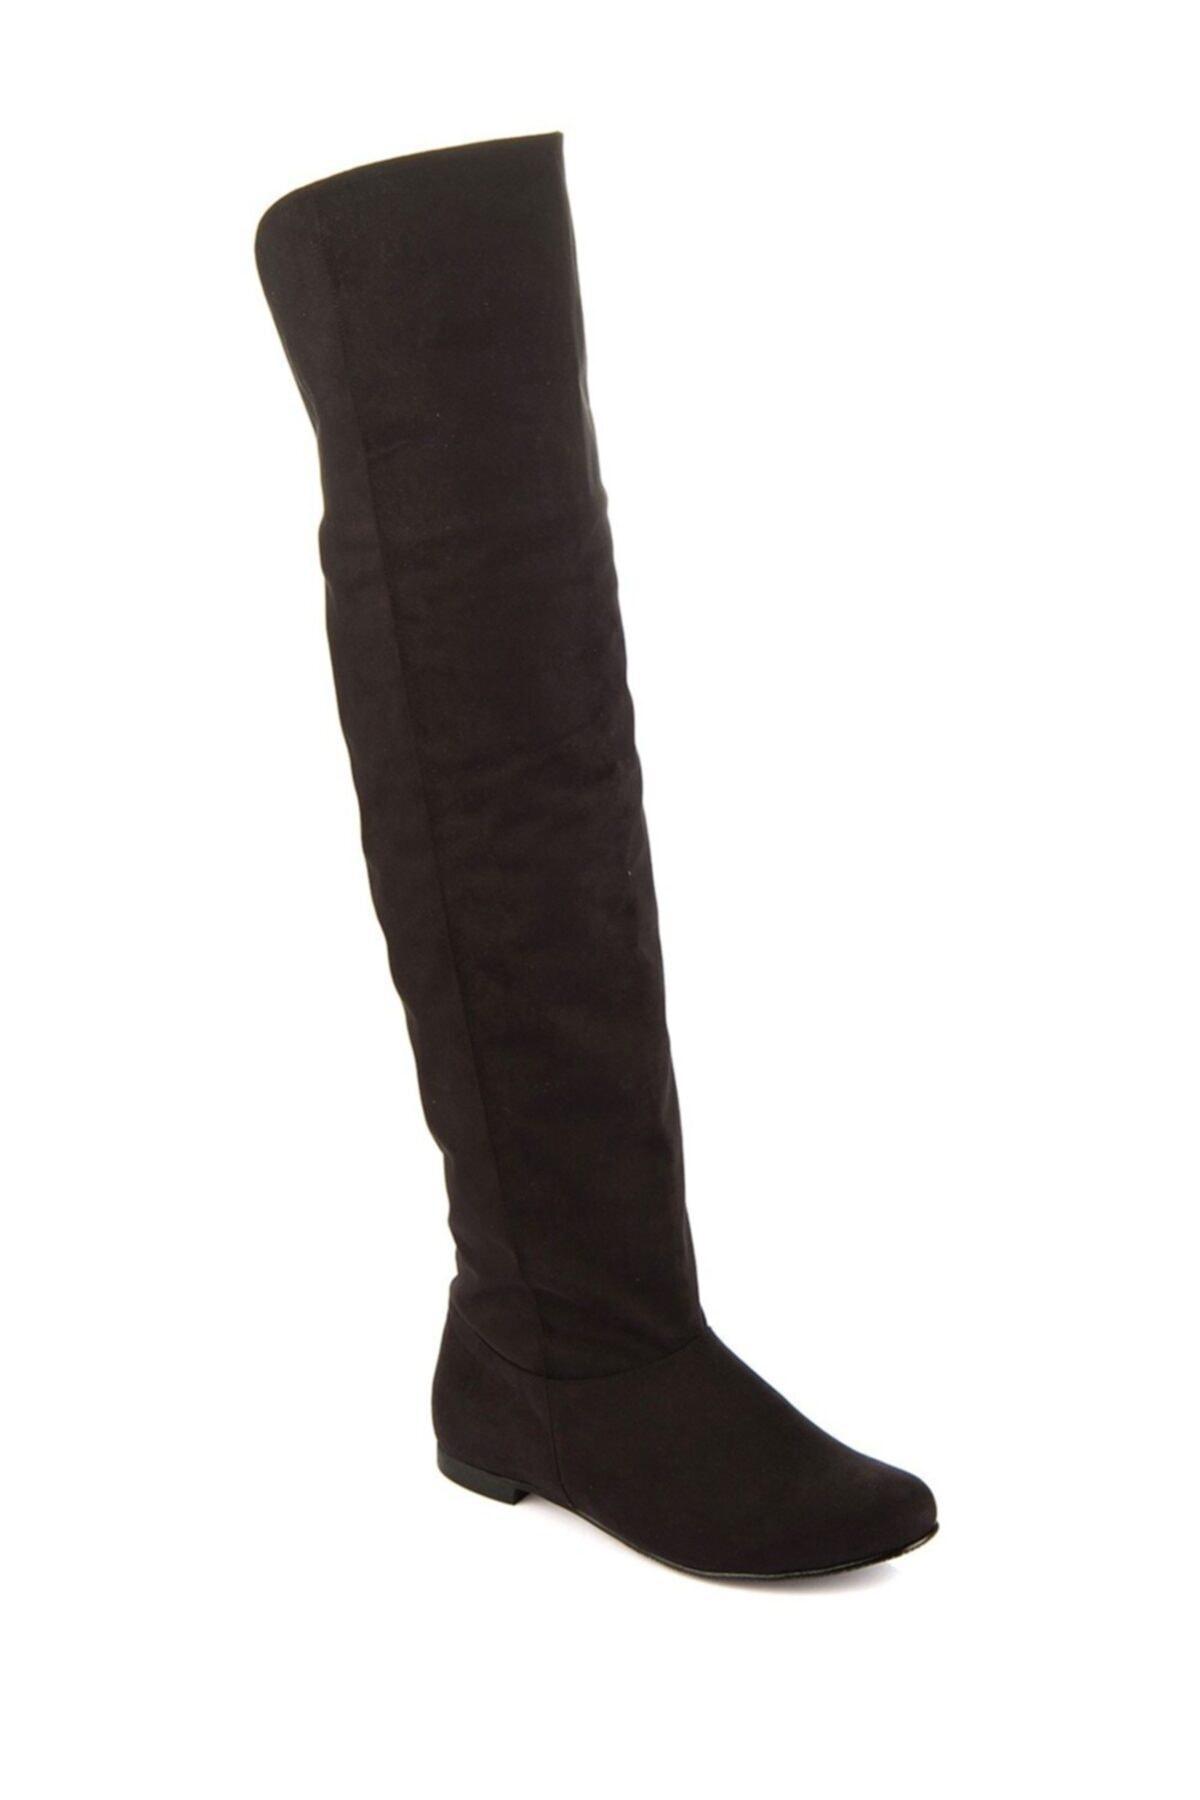 Fox Shoes Siyah Kadın Çizme 8248025902 2